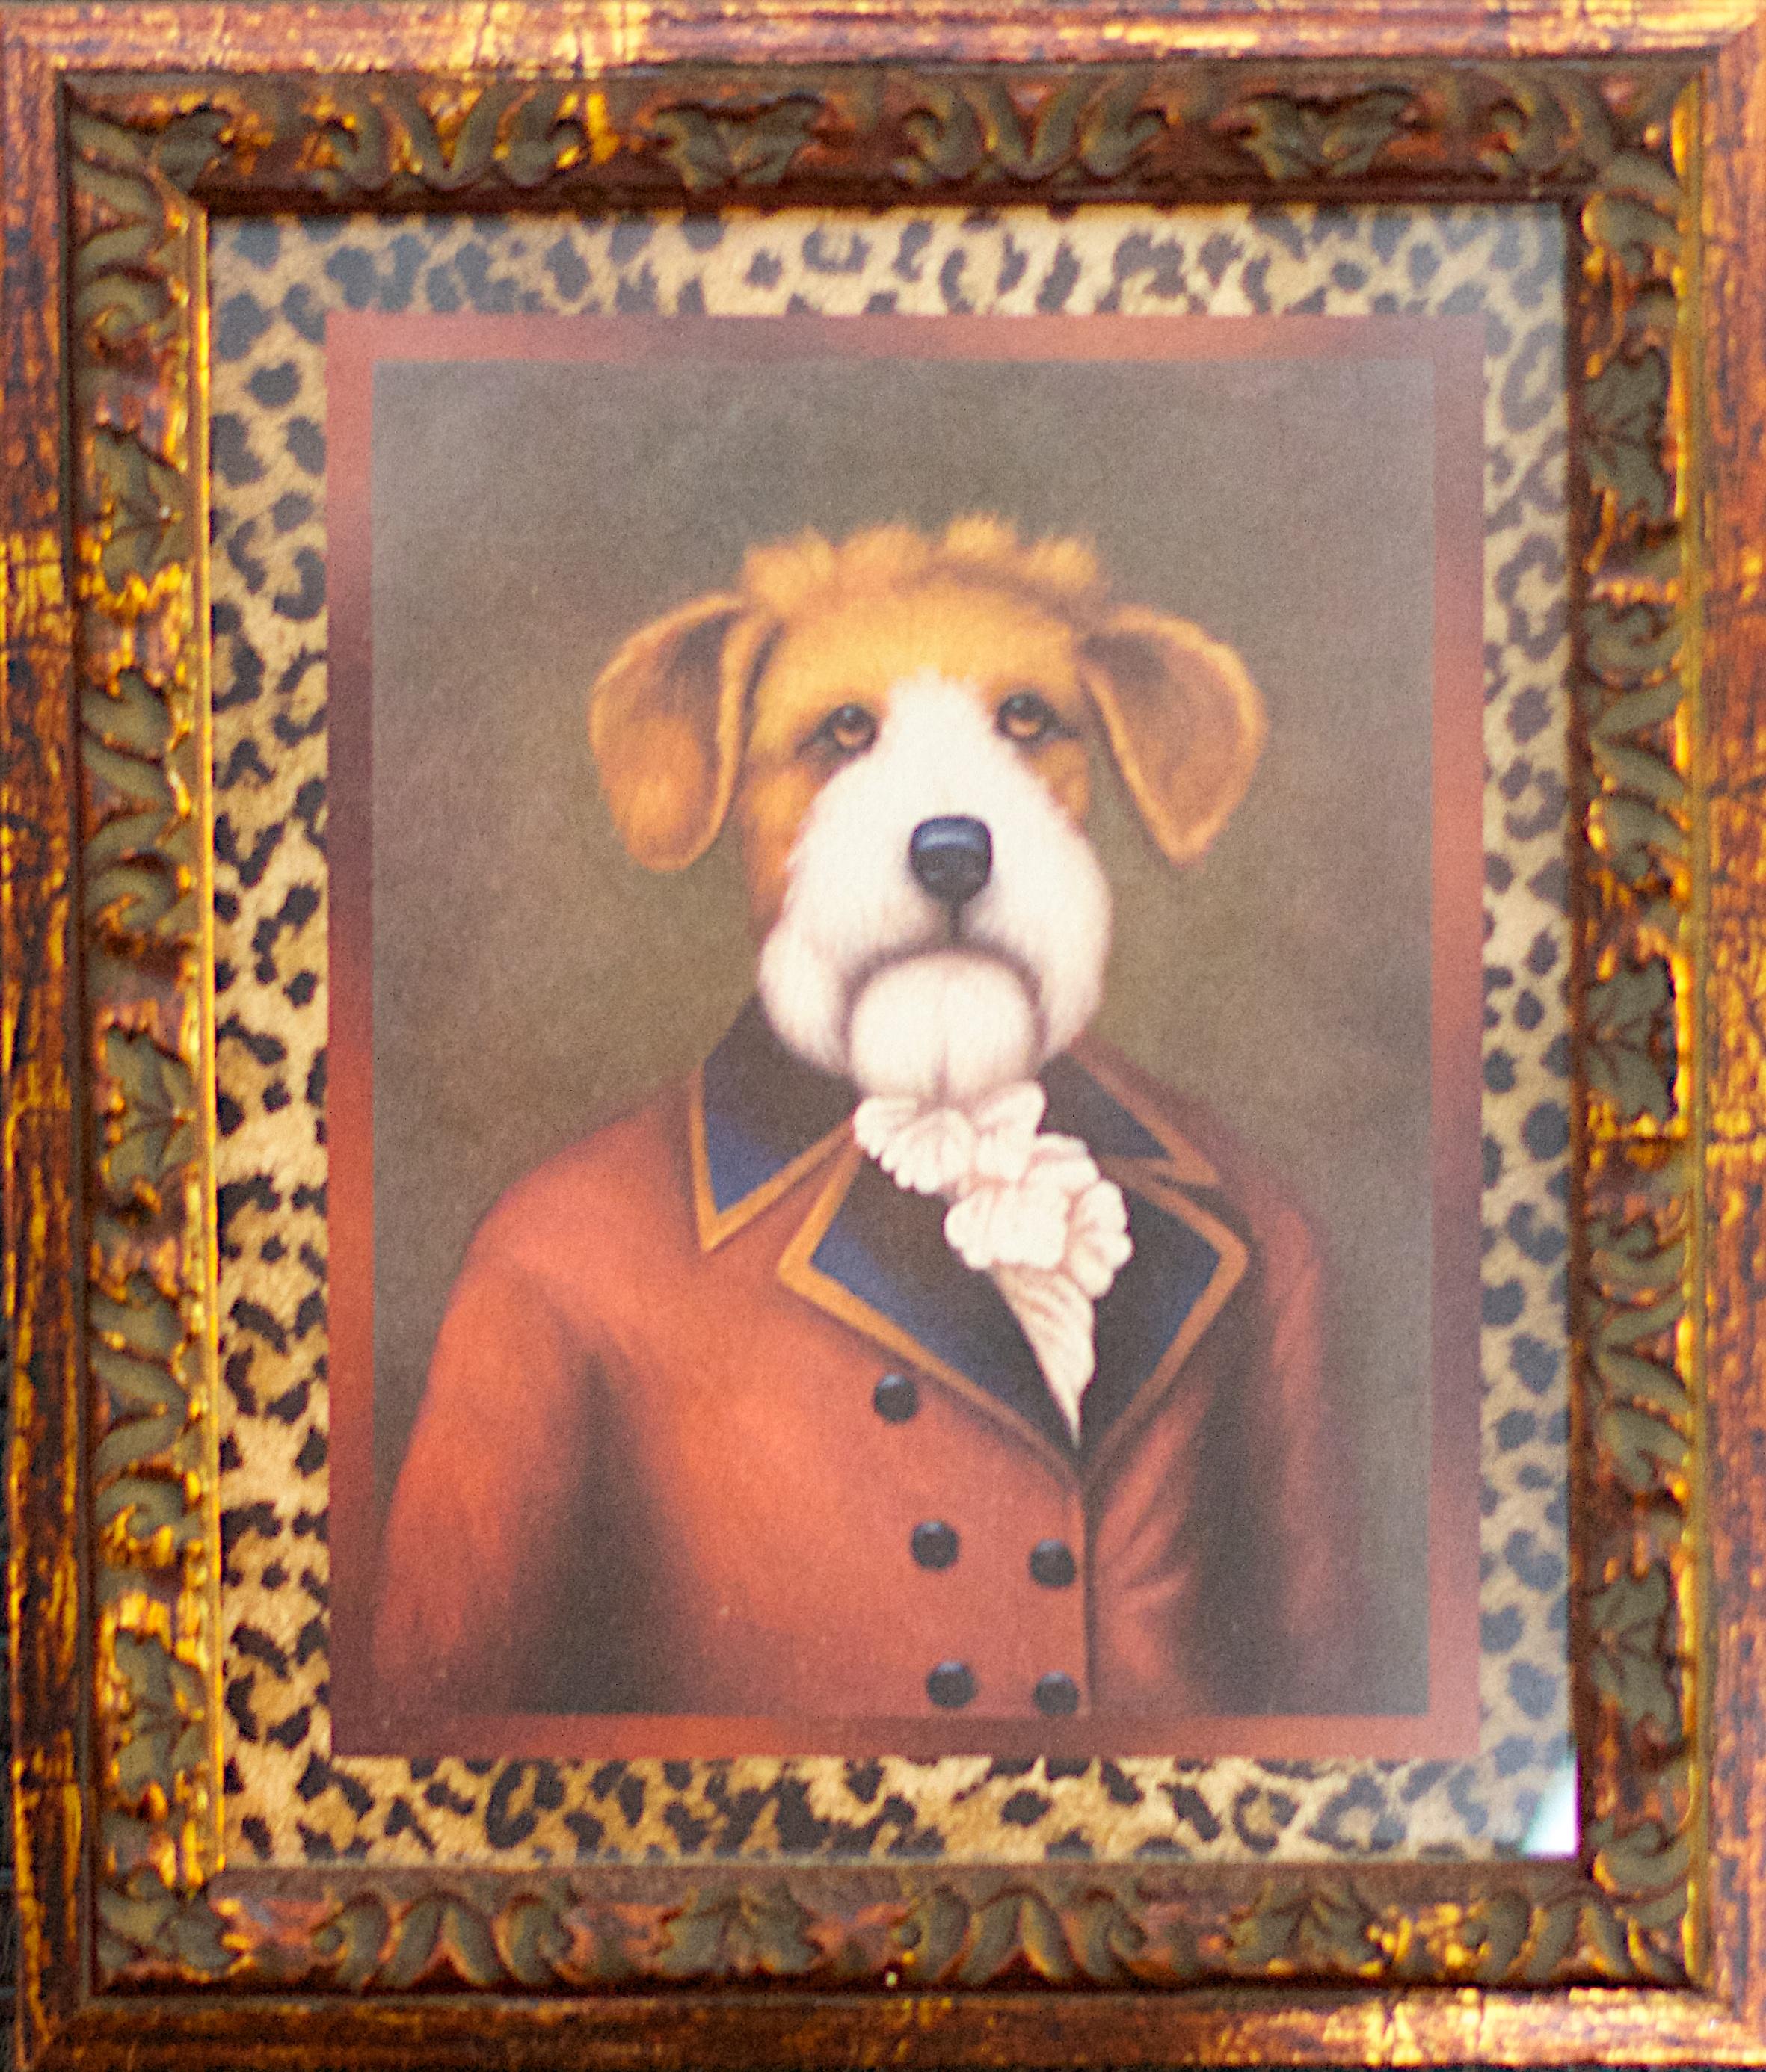 Fotos gratis : perro, pintura, textil, art, marco, tapiz 2362x2772 ...